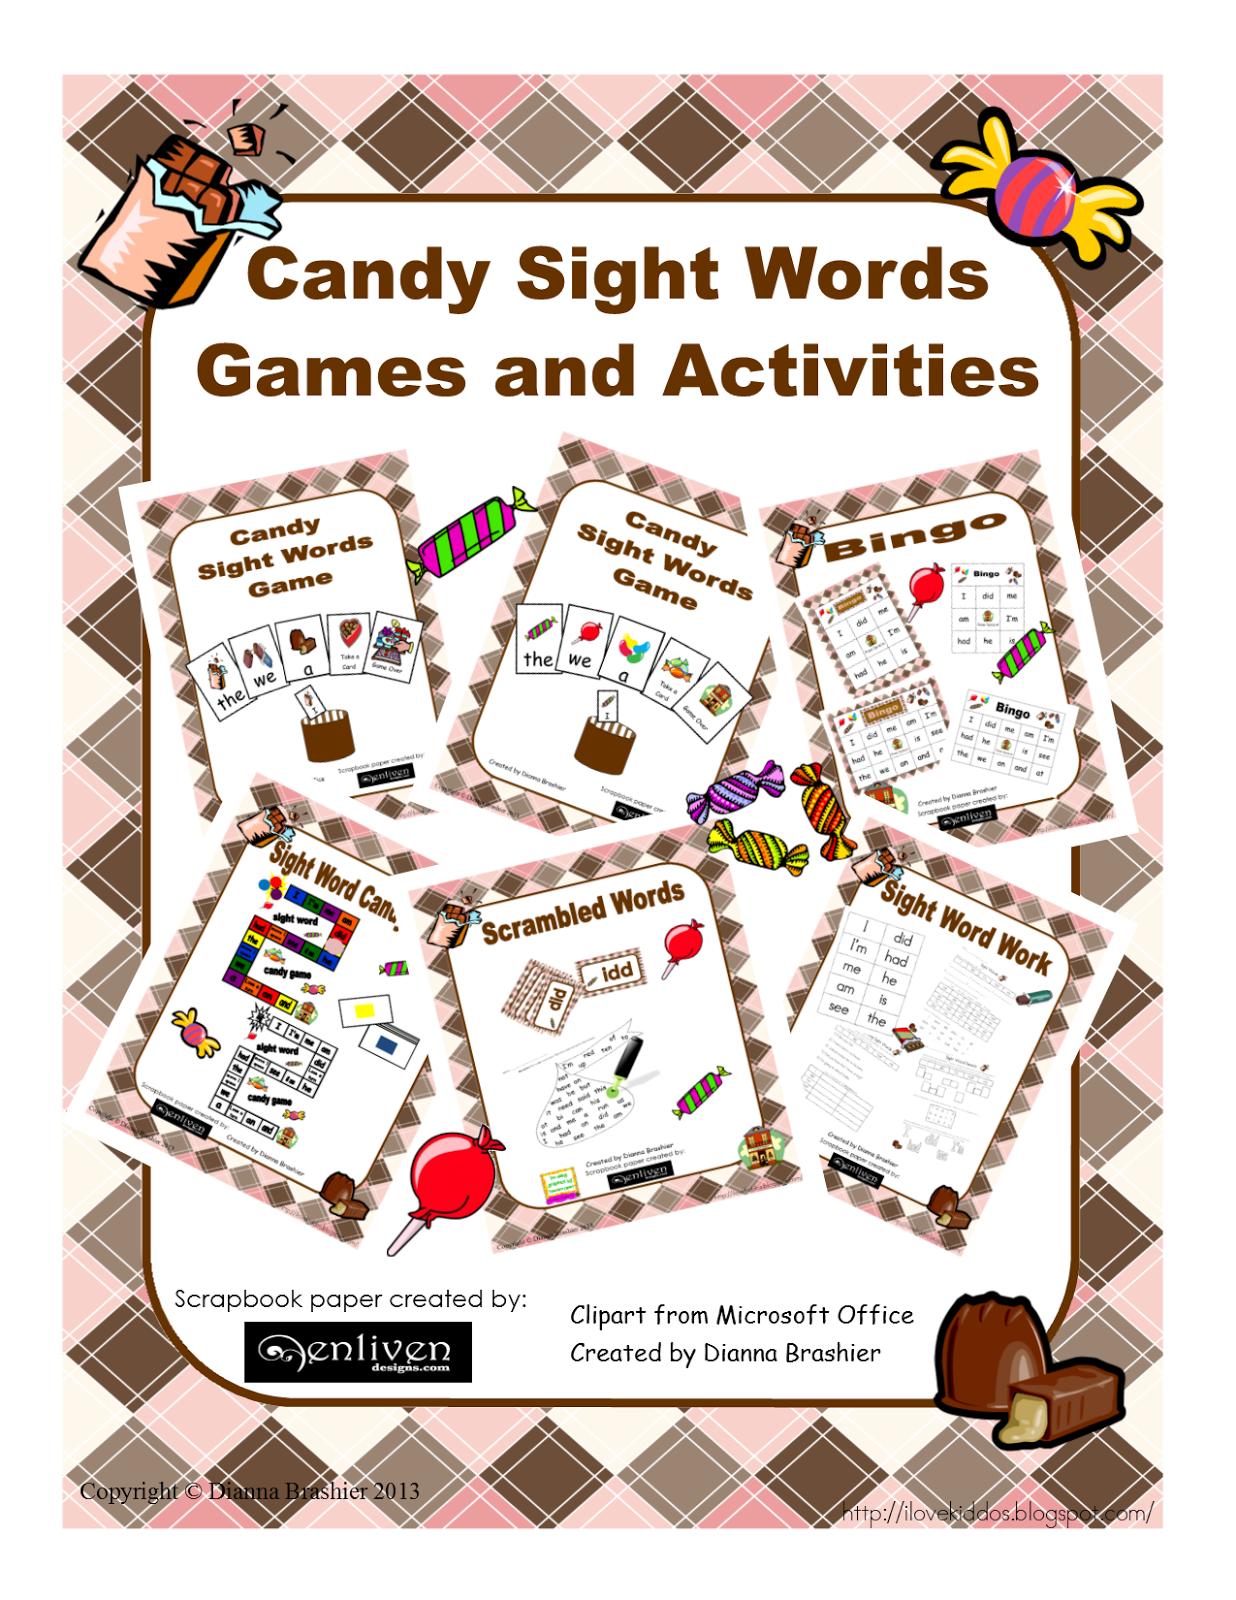 Teachers R Us Candy Sight Word Activities